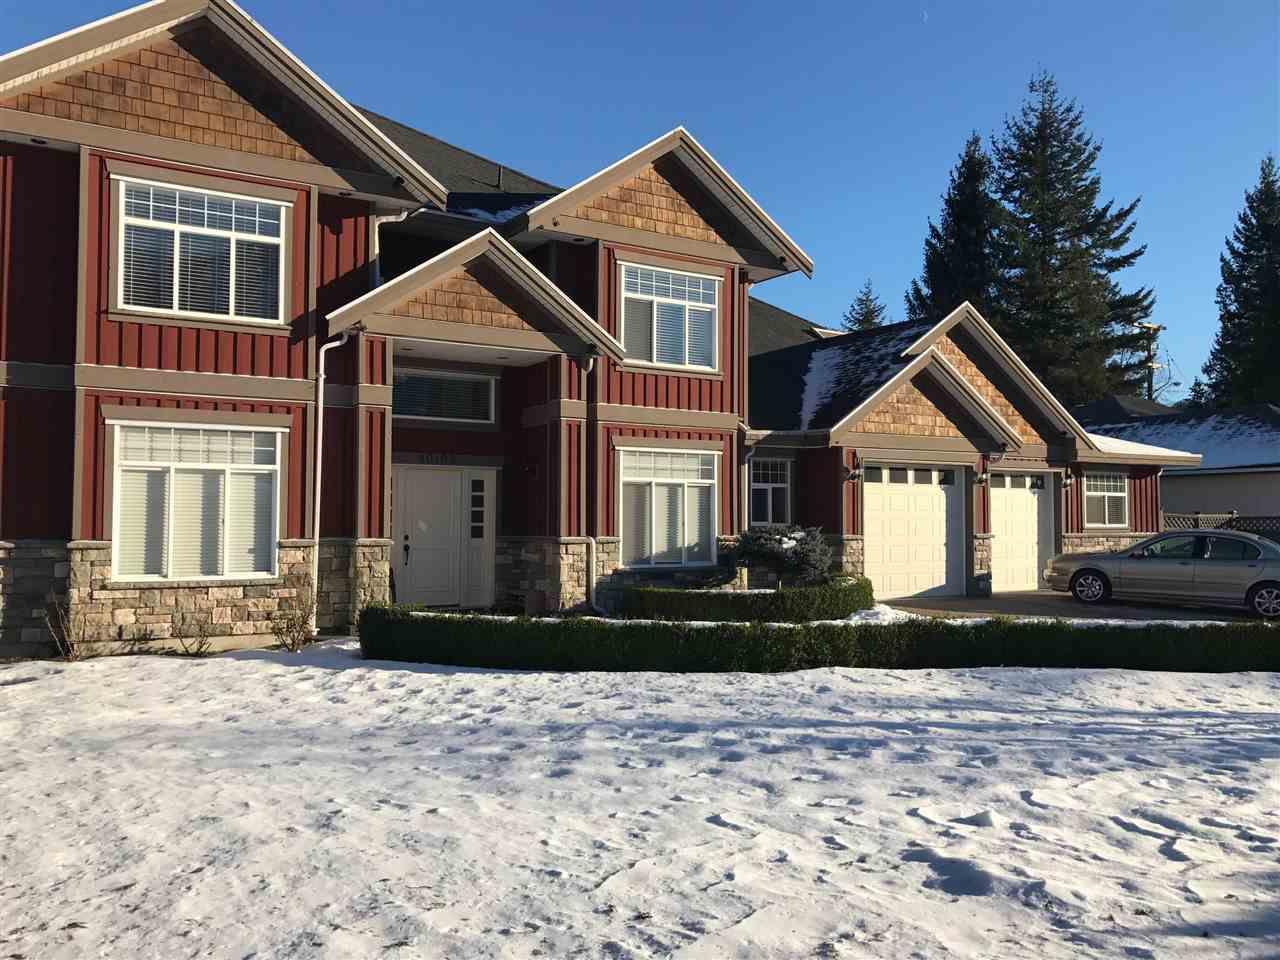 Main Photo: 40102 DIAMOND HEAD ROAD in Squamish: Garibaldi Estates House for sale : MLS®# R2128743